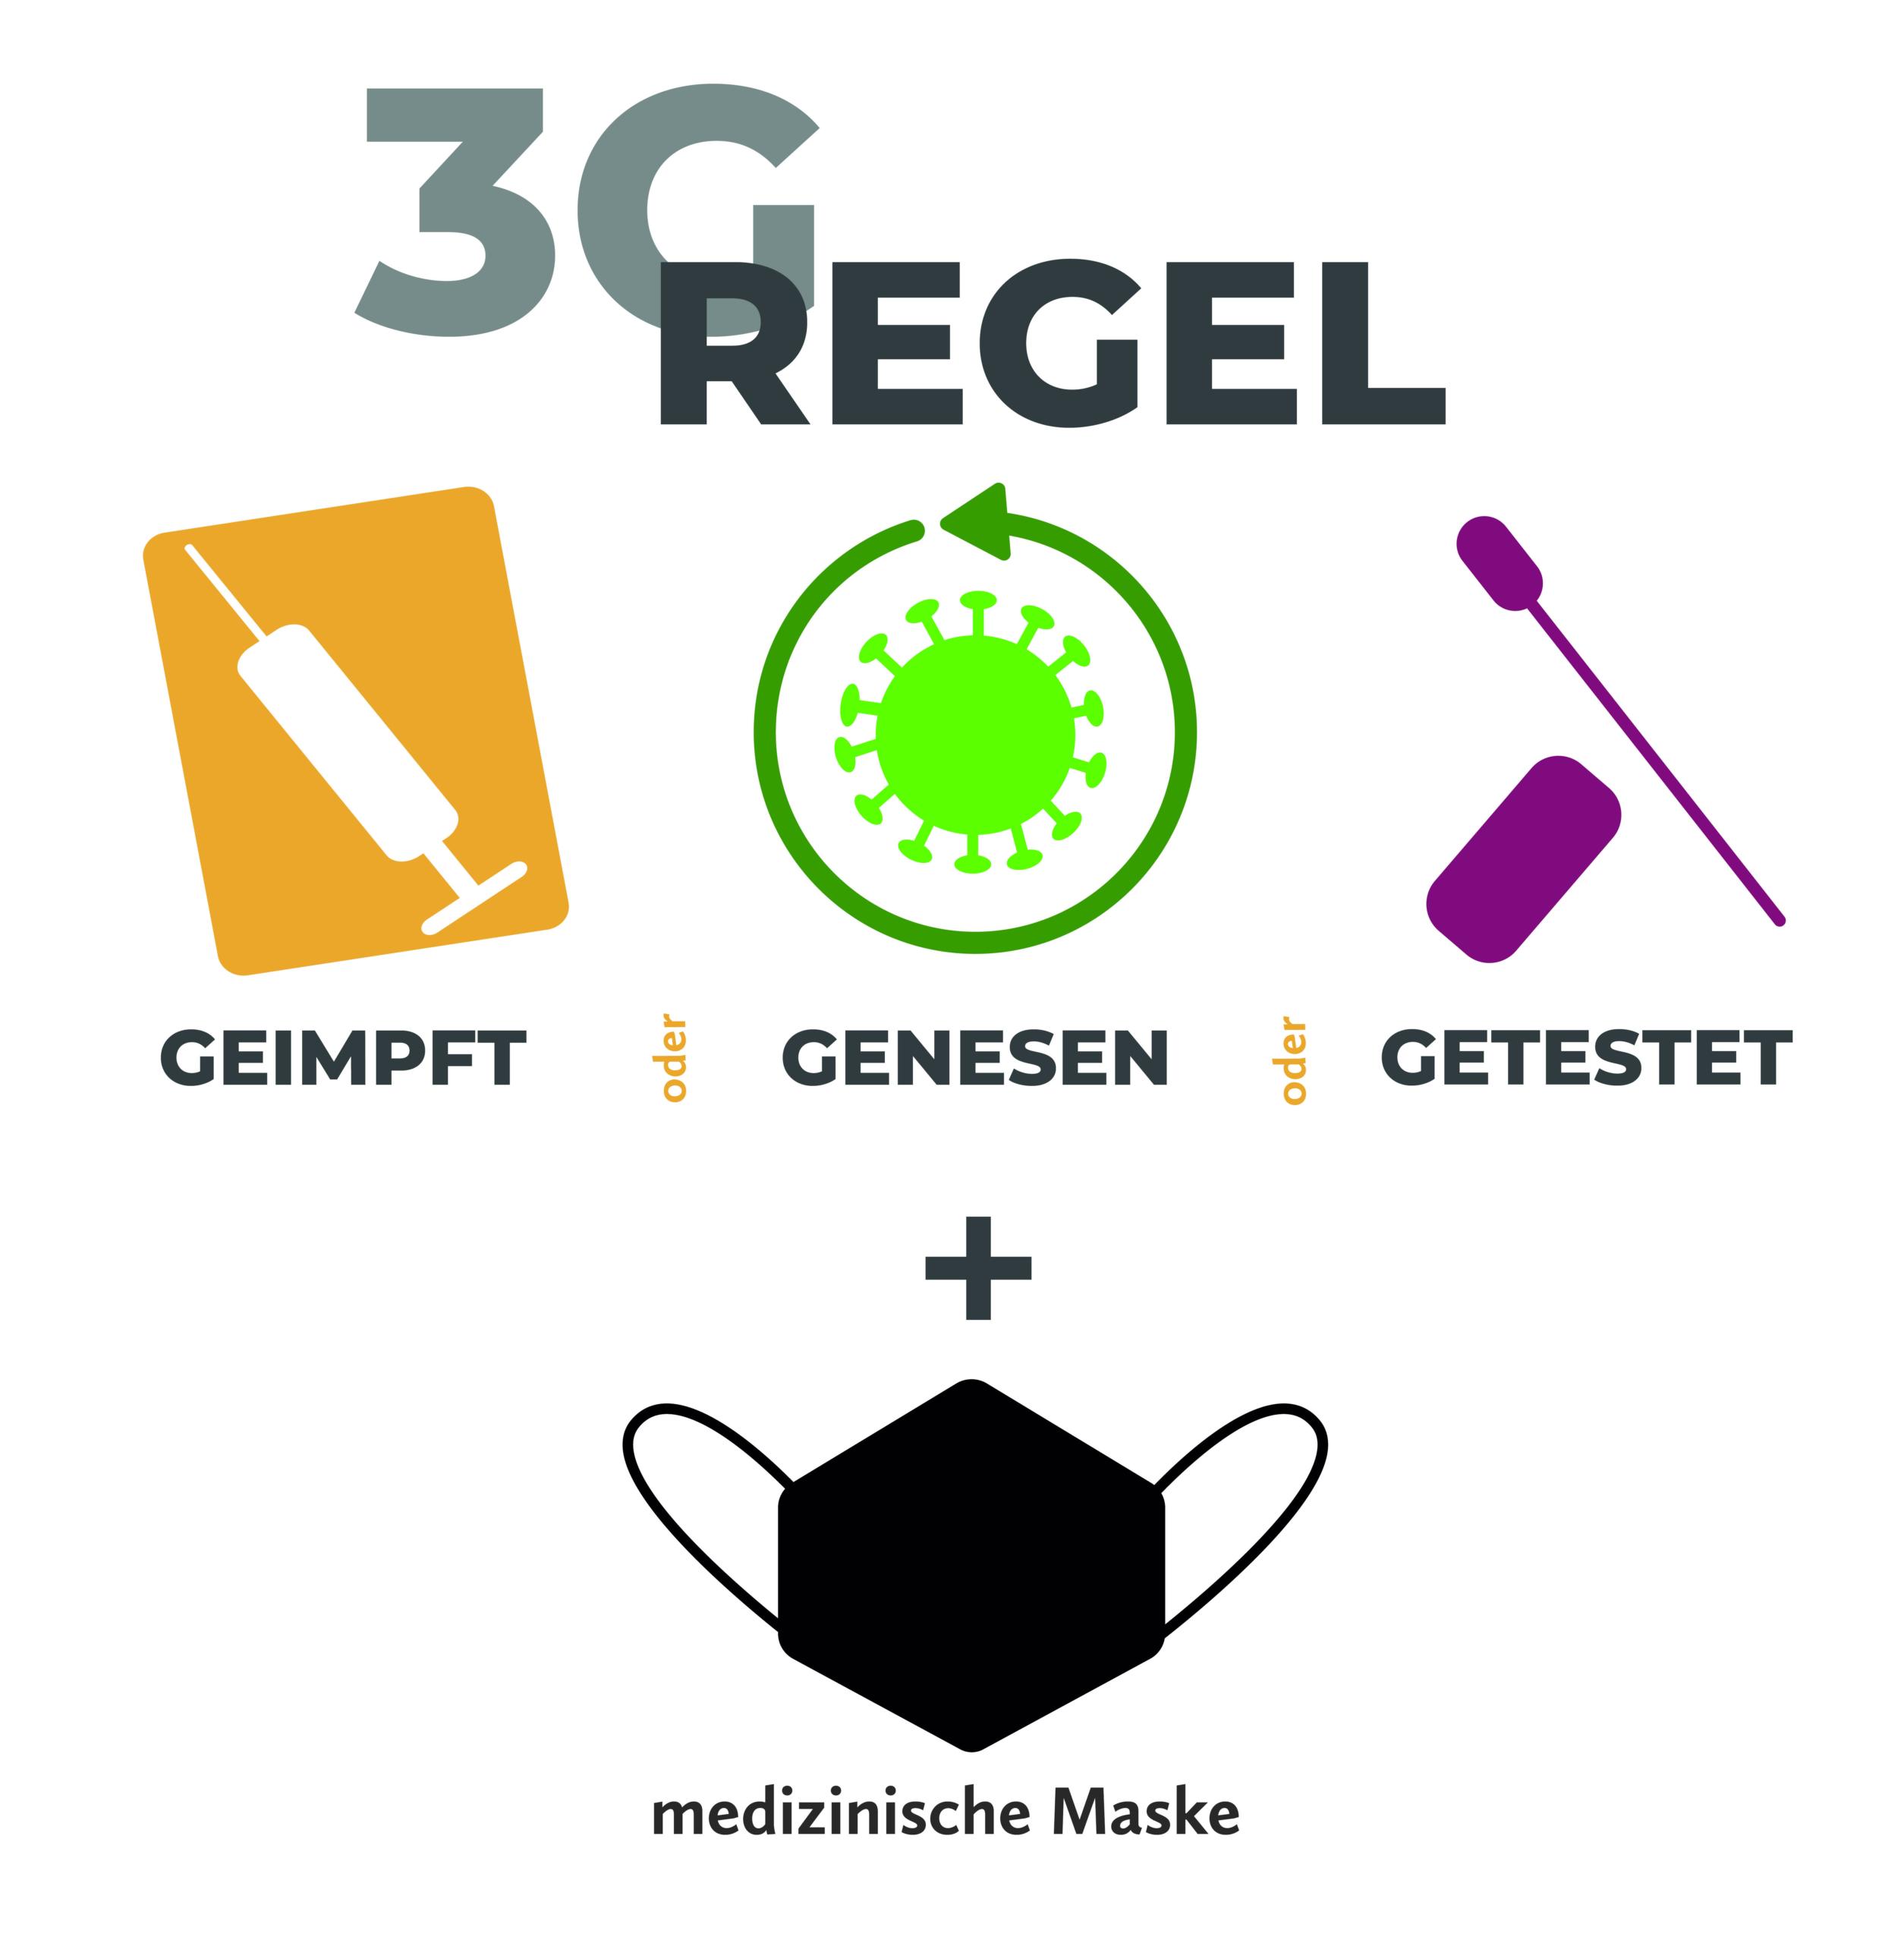 3G Regel Geimpft Genesen Getestet mediz. Maske